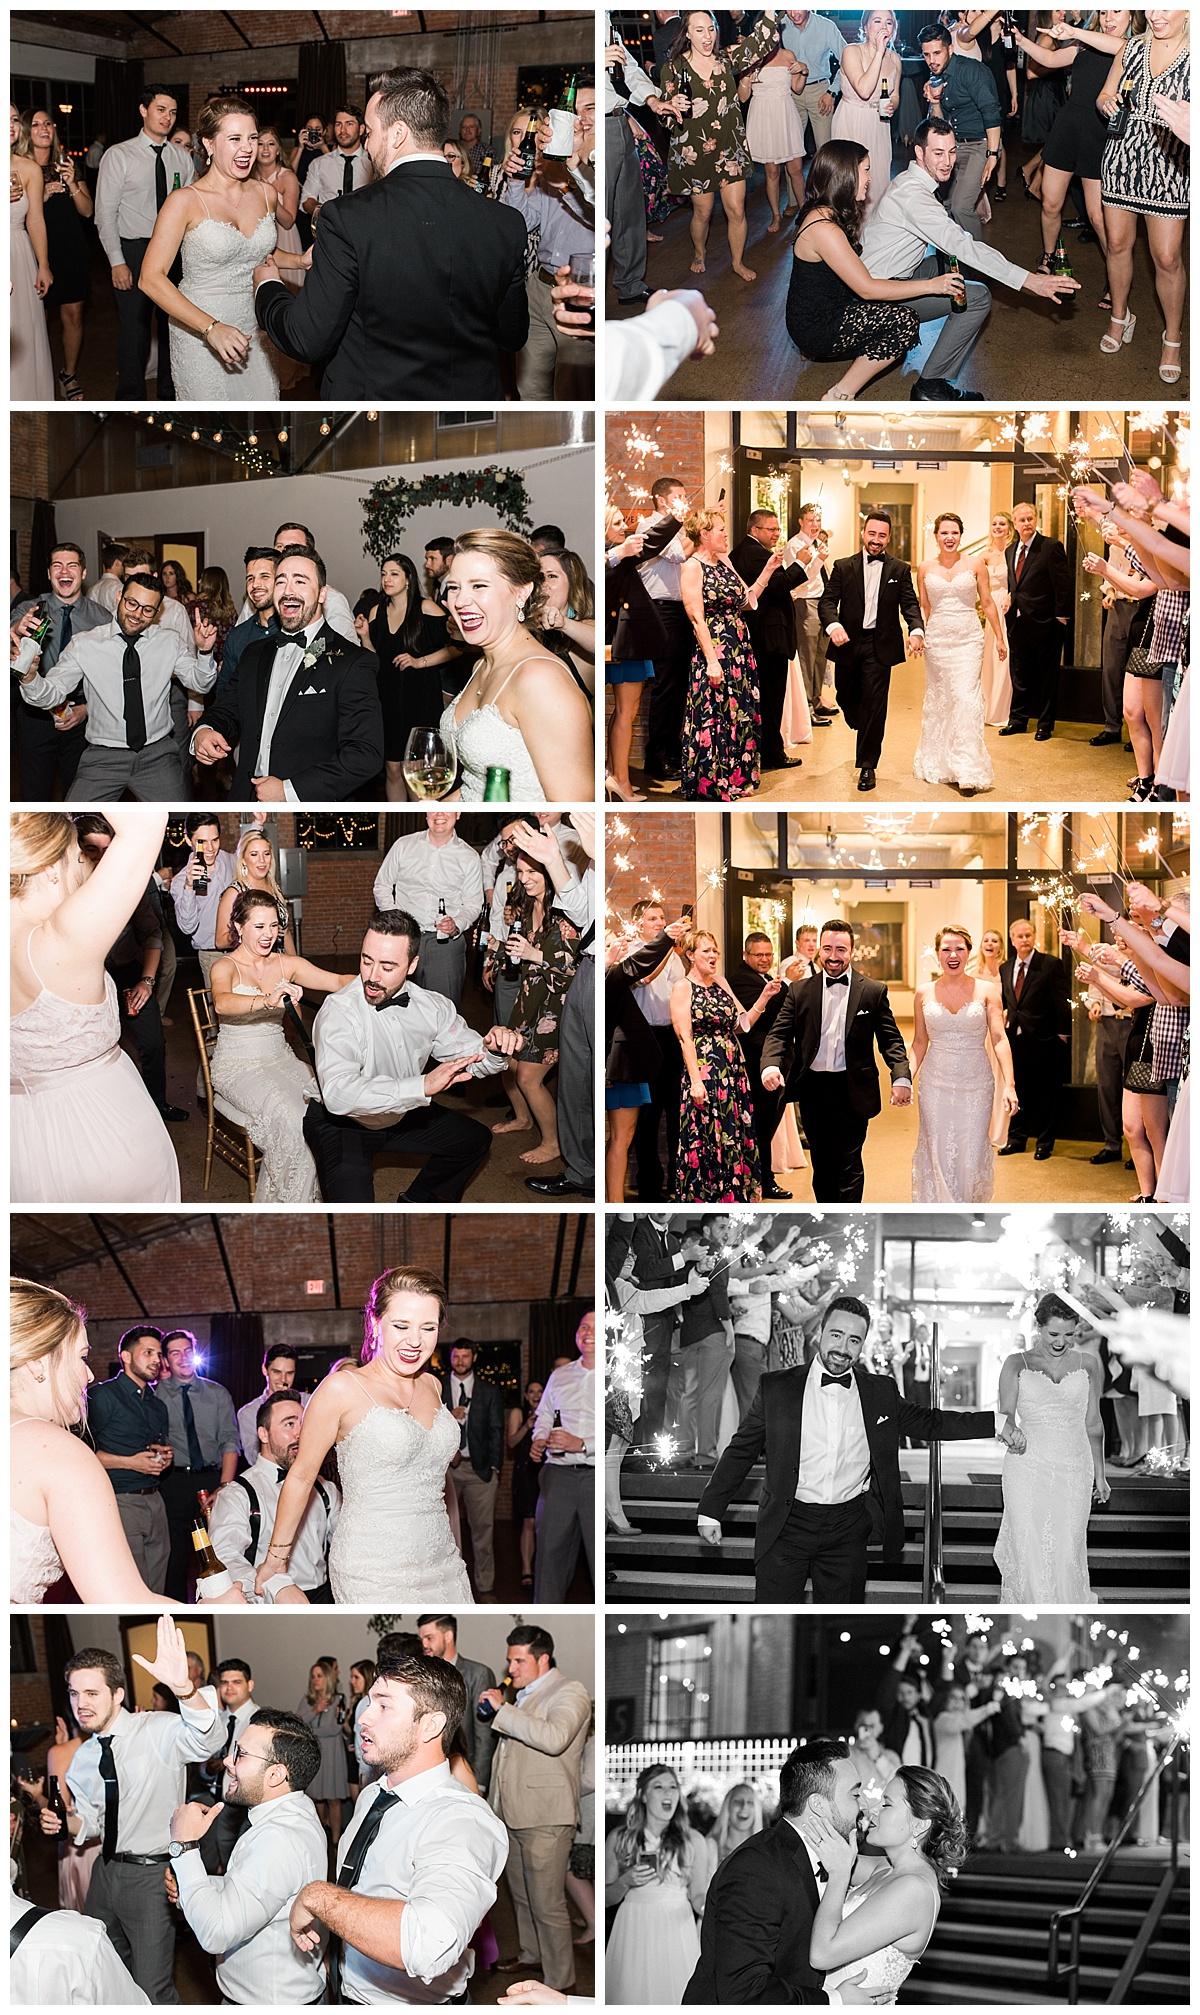 hickory-stree-annex-wedding-ar-photography-nicole-nolan-18.jpg